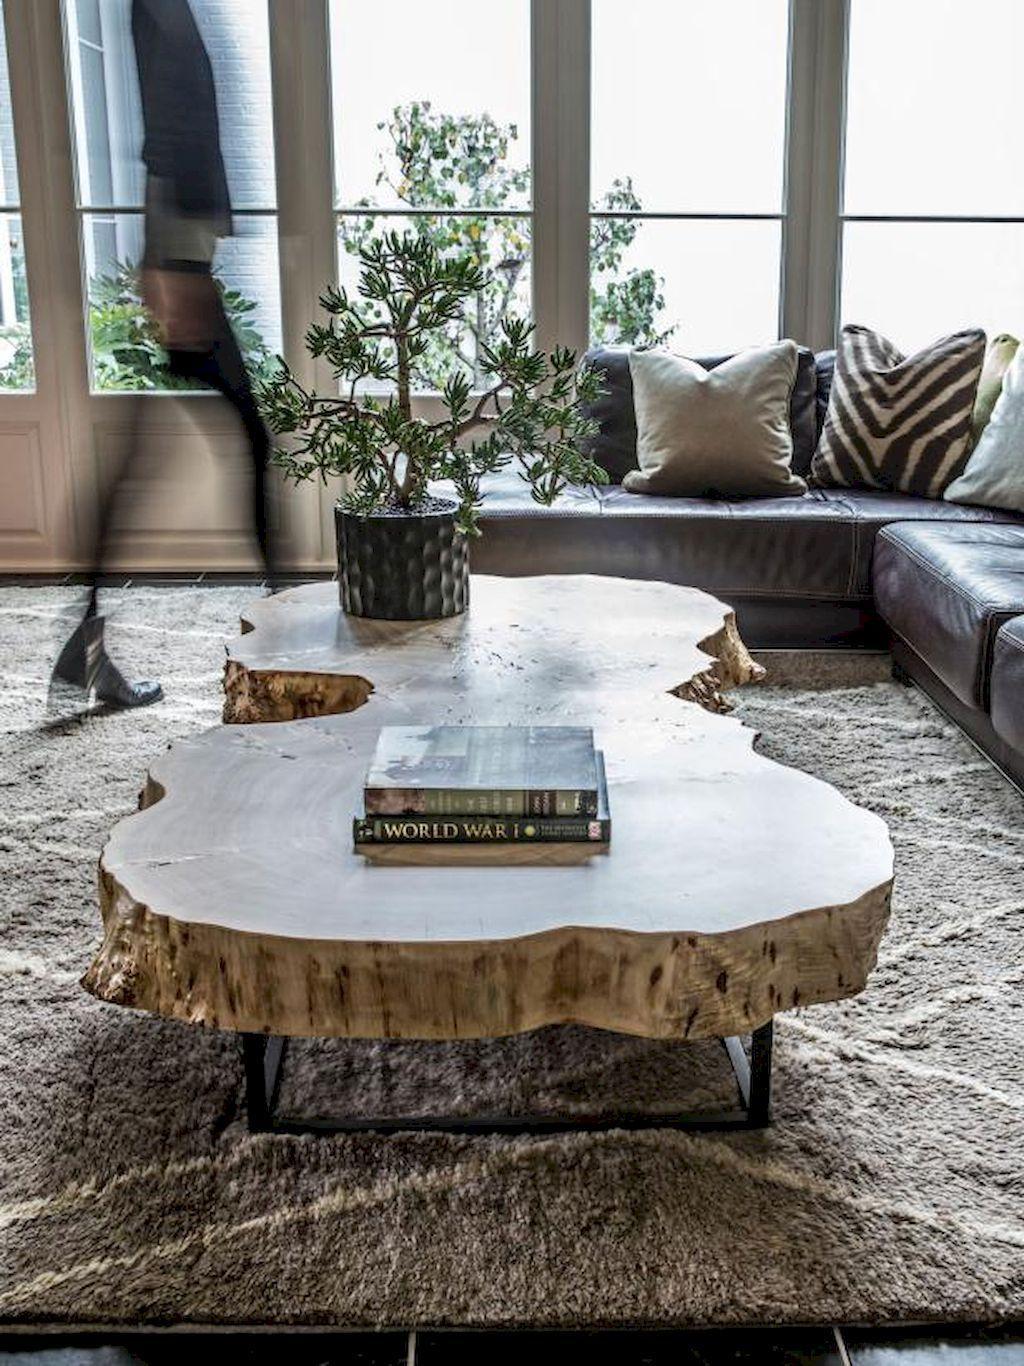 11 Free Modern Coffee Table Ideas You Can Diy Today Moderncoffeetable Coffeetableideas Cof Wooden Coffee Table Designs Coffee Table Rustic Coffee Tables